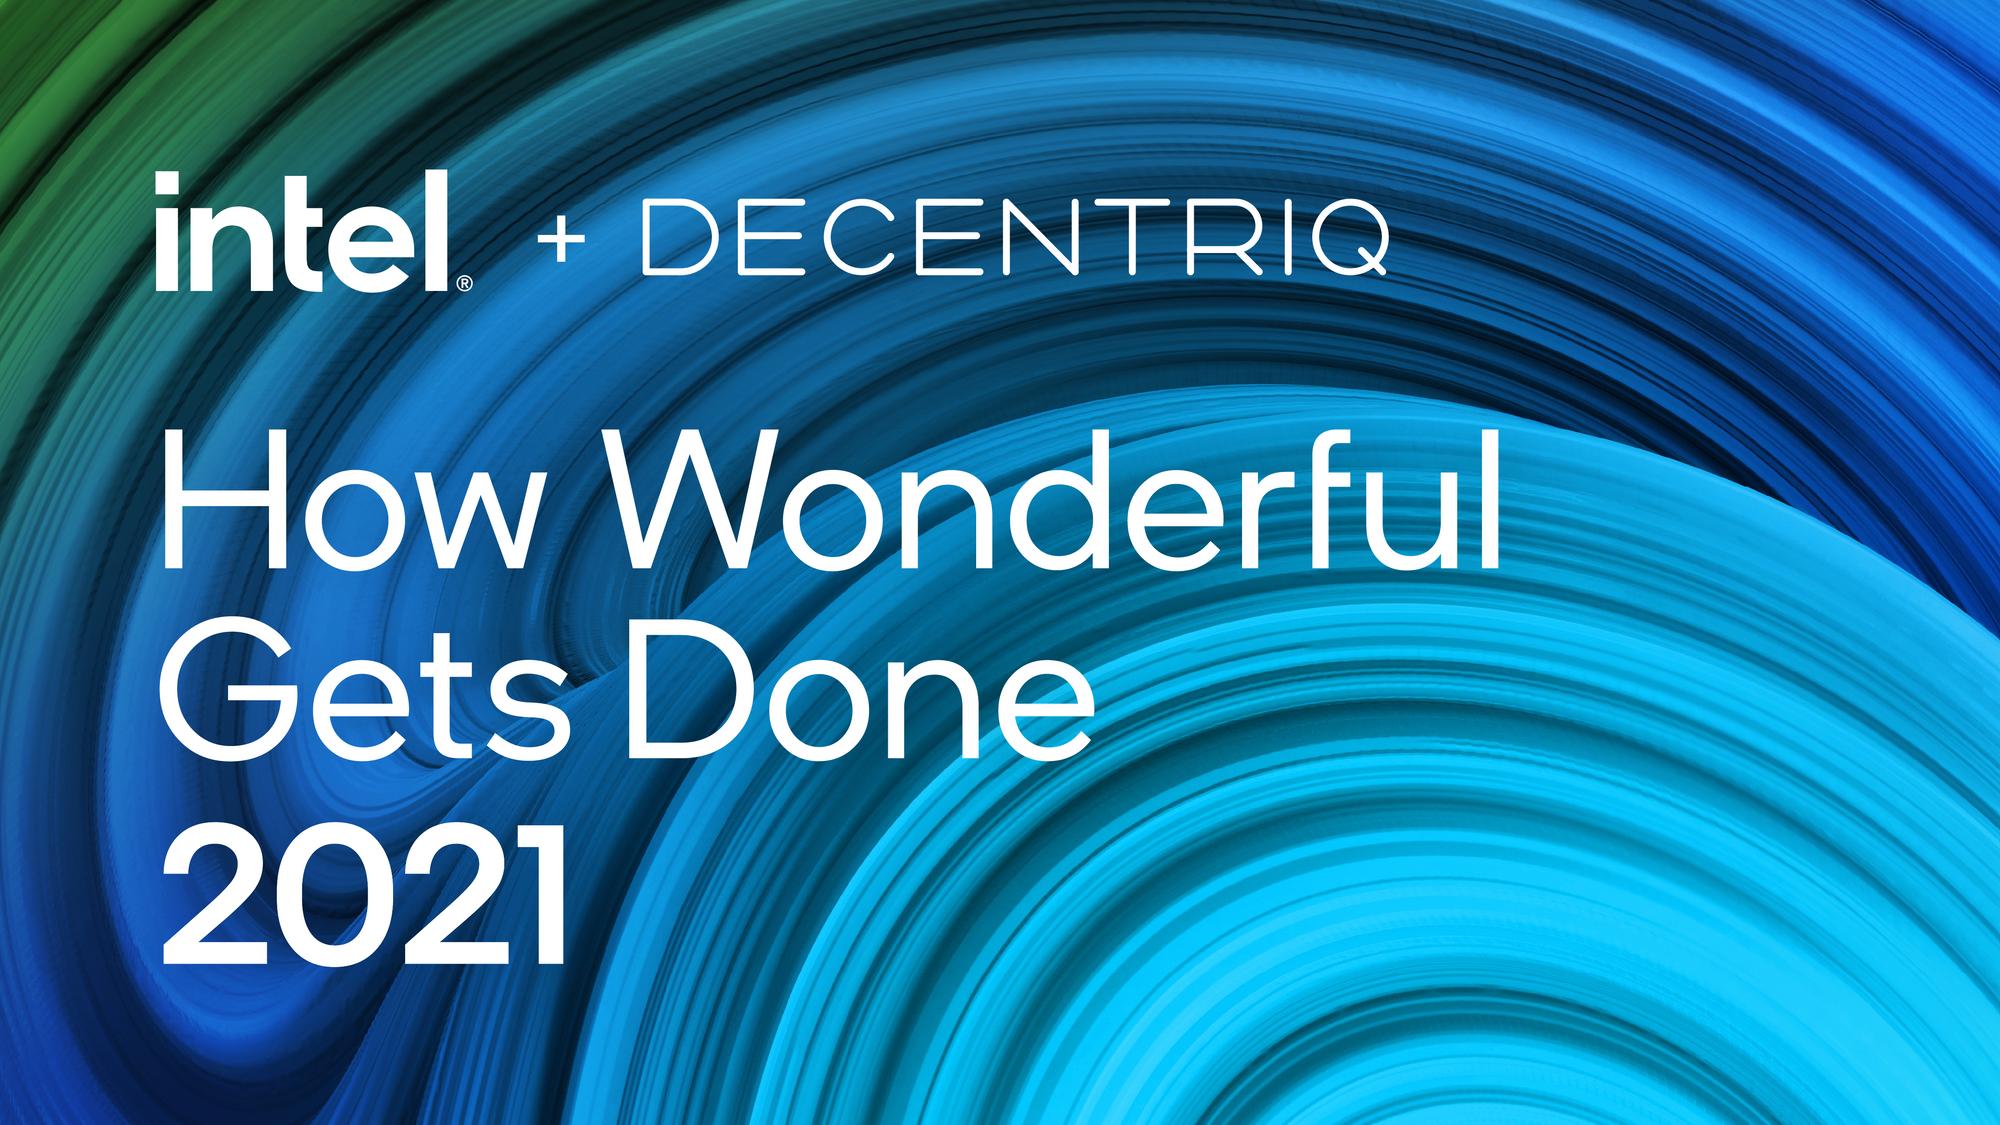 decentriq-is-a-launch-partner-of-intel